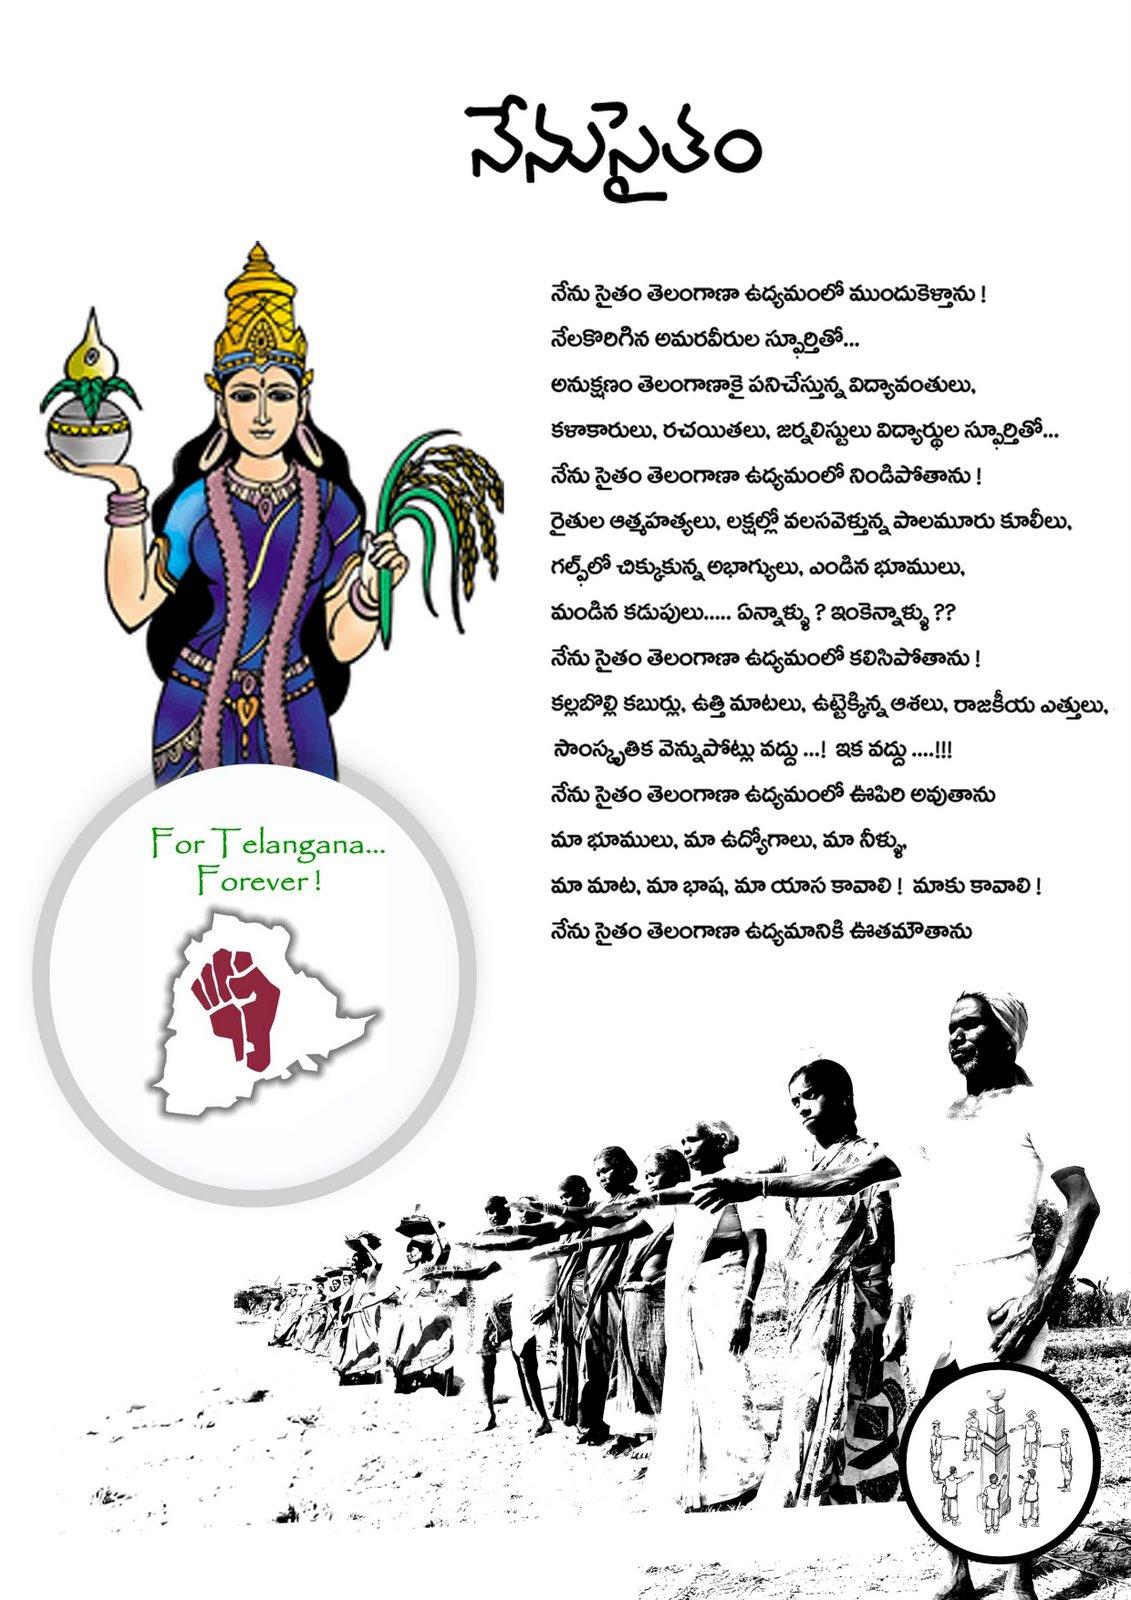 The Story Of Telangana: